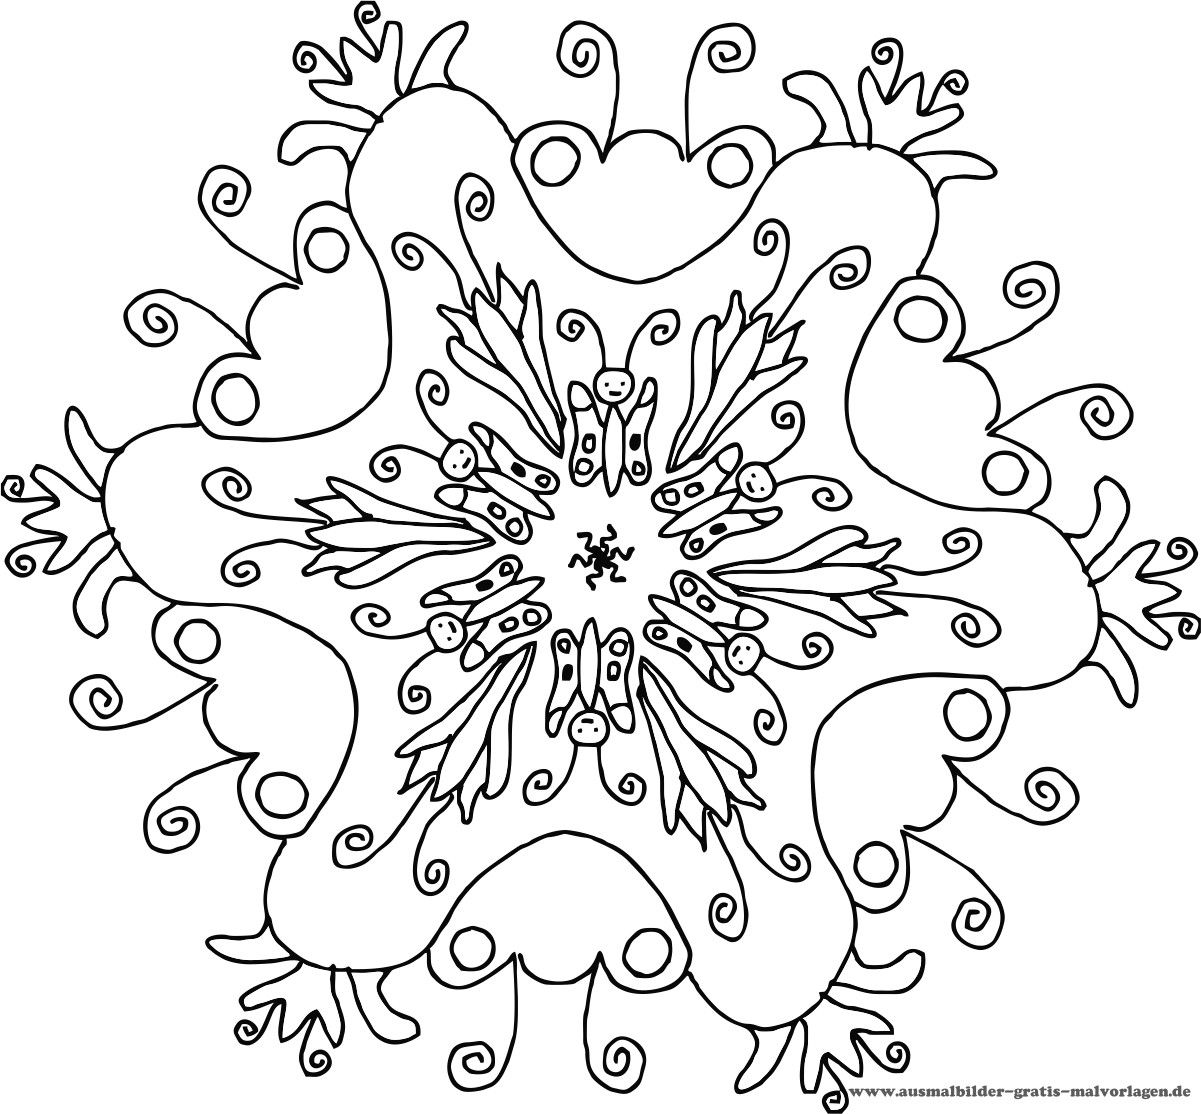 mandalas | Mandalas zum Ausdrucken | kostenlose Mandala für Kids ...